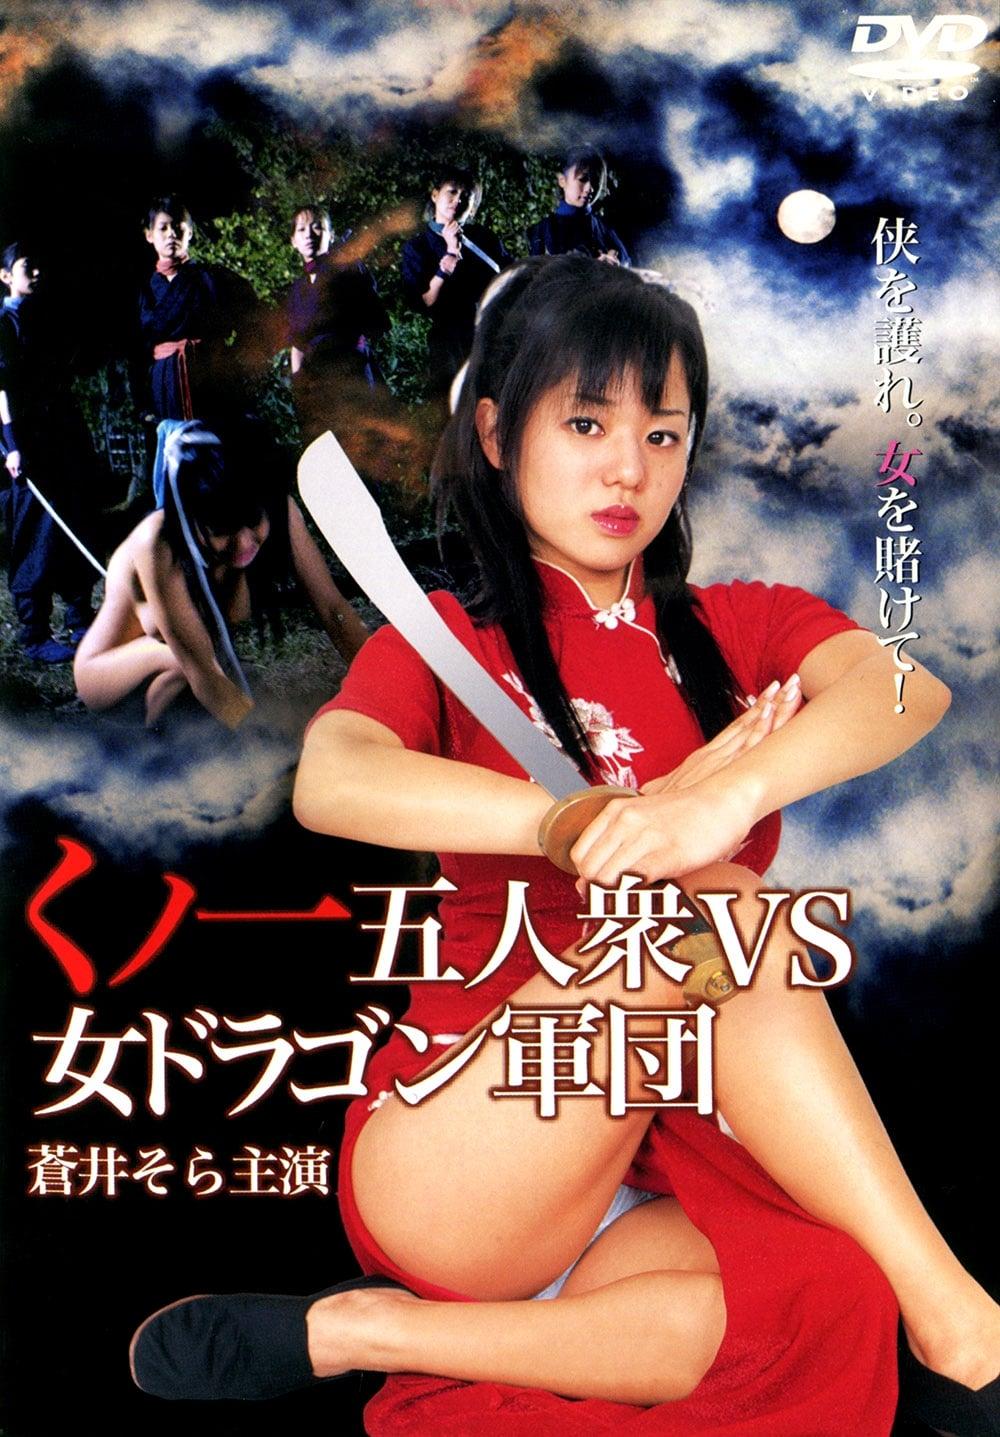 Amazons Dragon Woman vs. Kunoichi